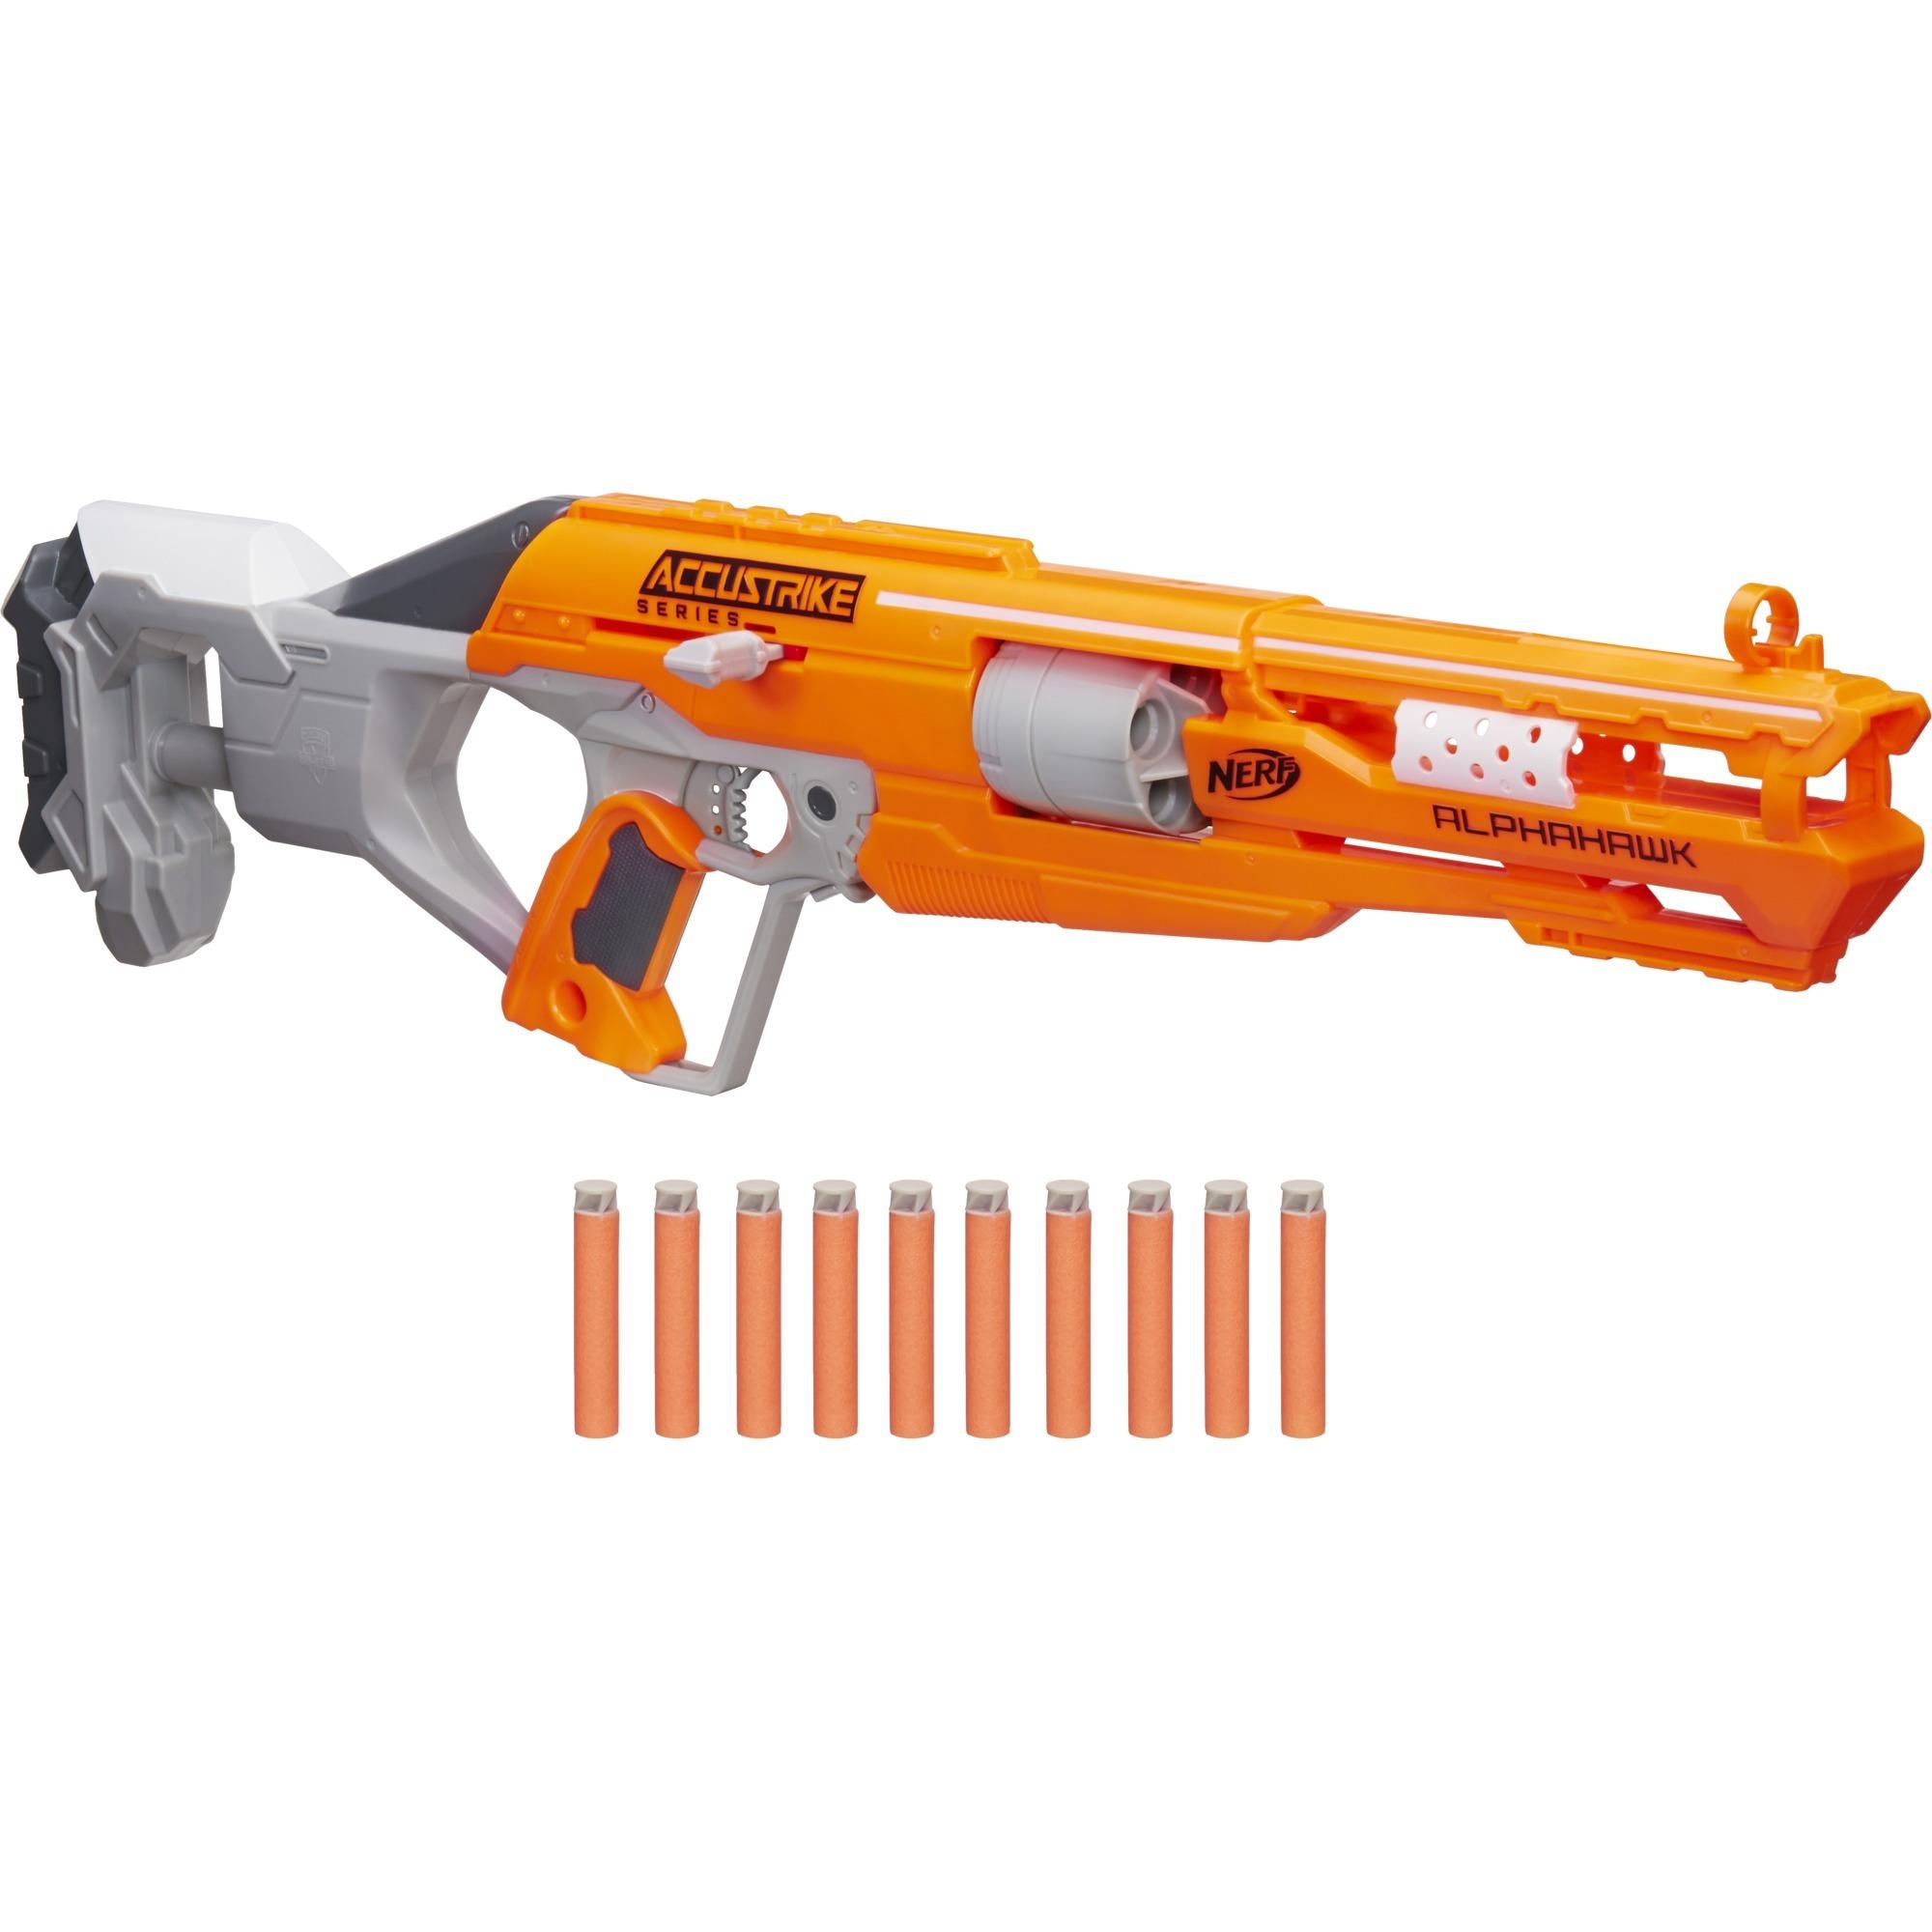 AlphaHawk Pistola de juguete, Pistola Nerf